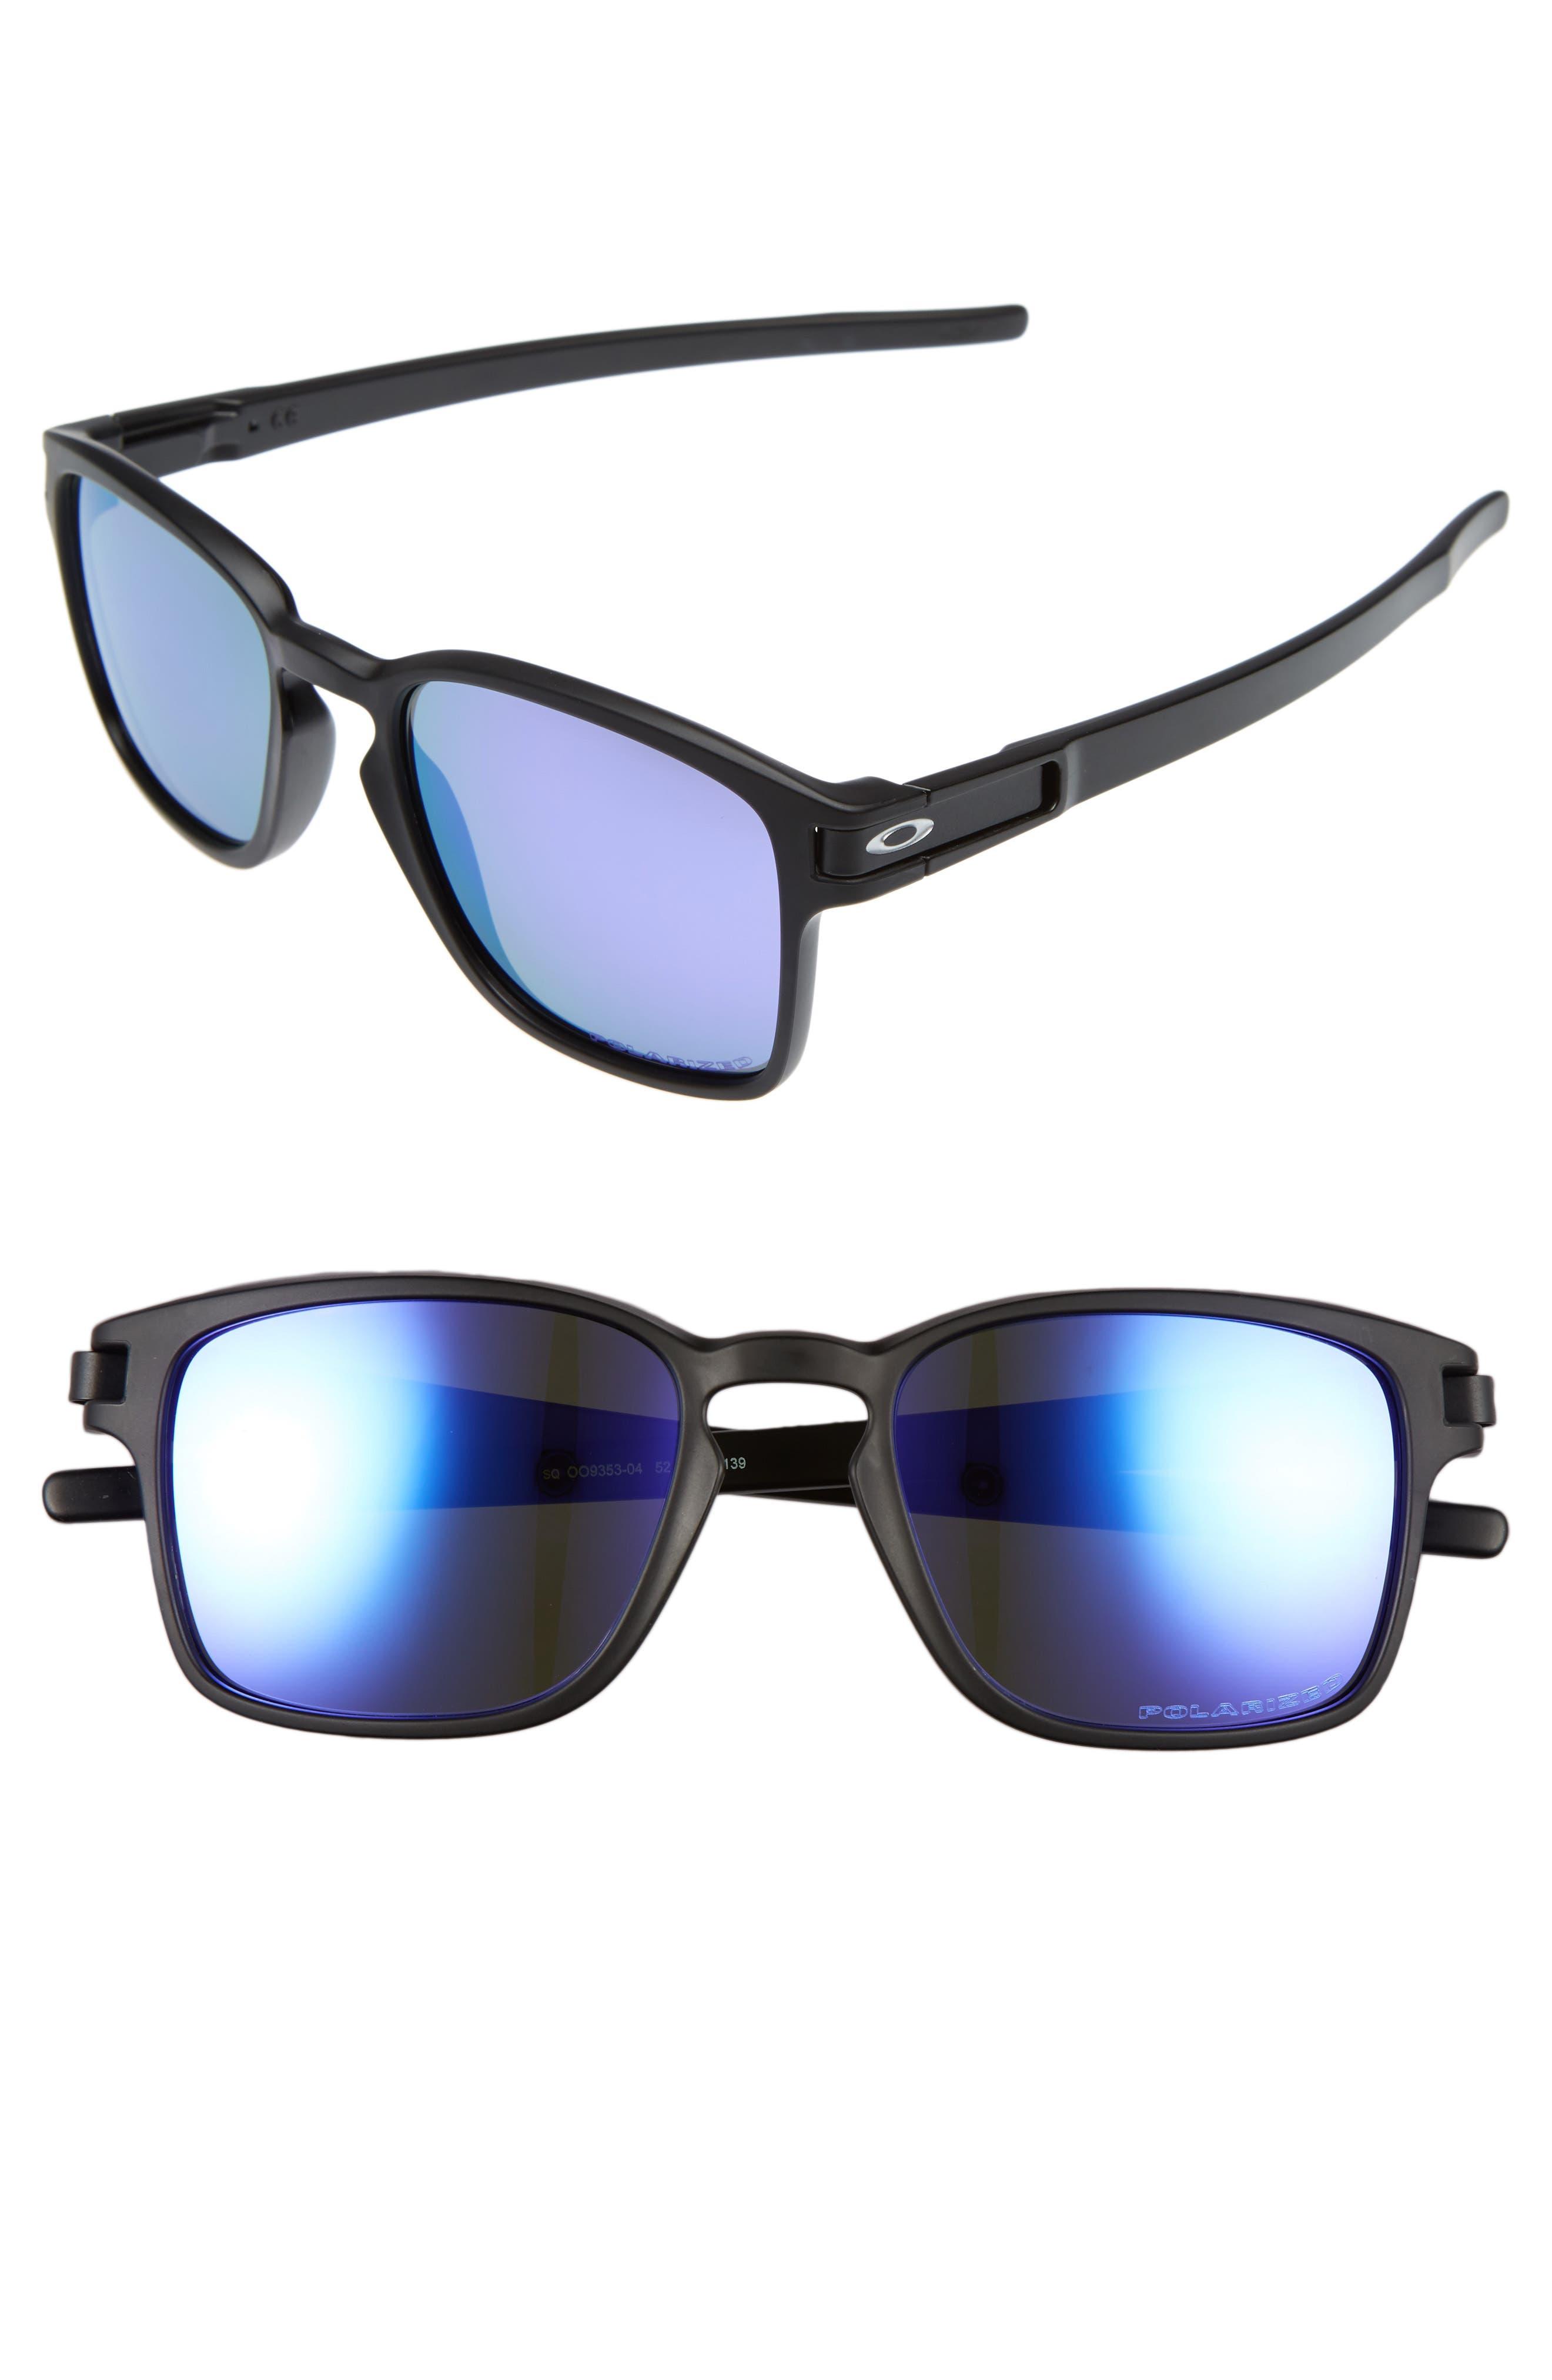 OAKLEY Latch 52mm Polarized Rectangular Sunglasses